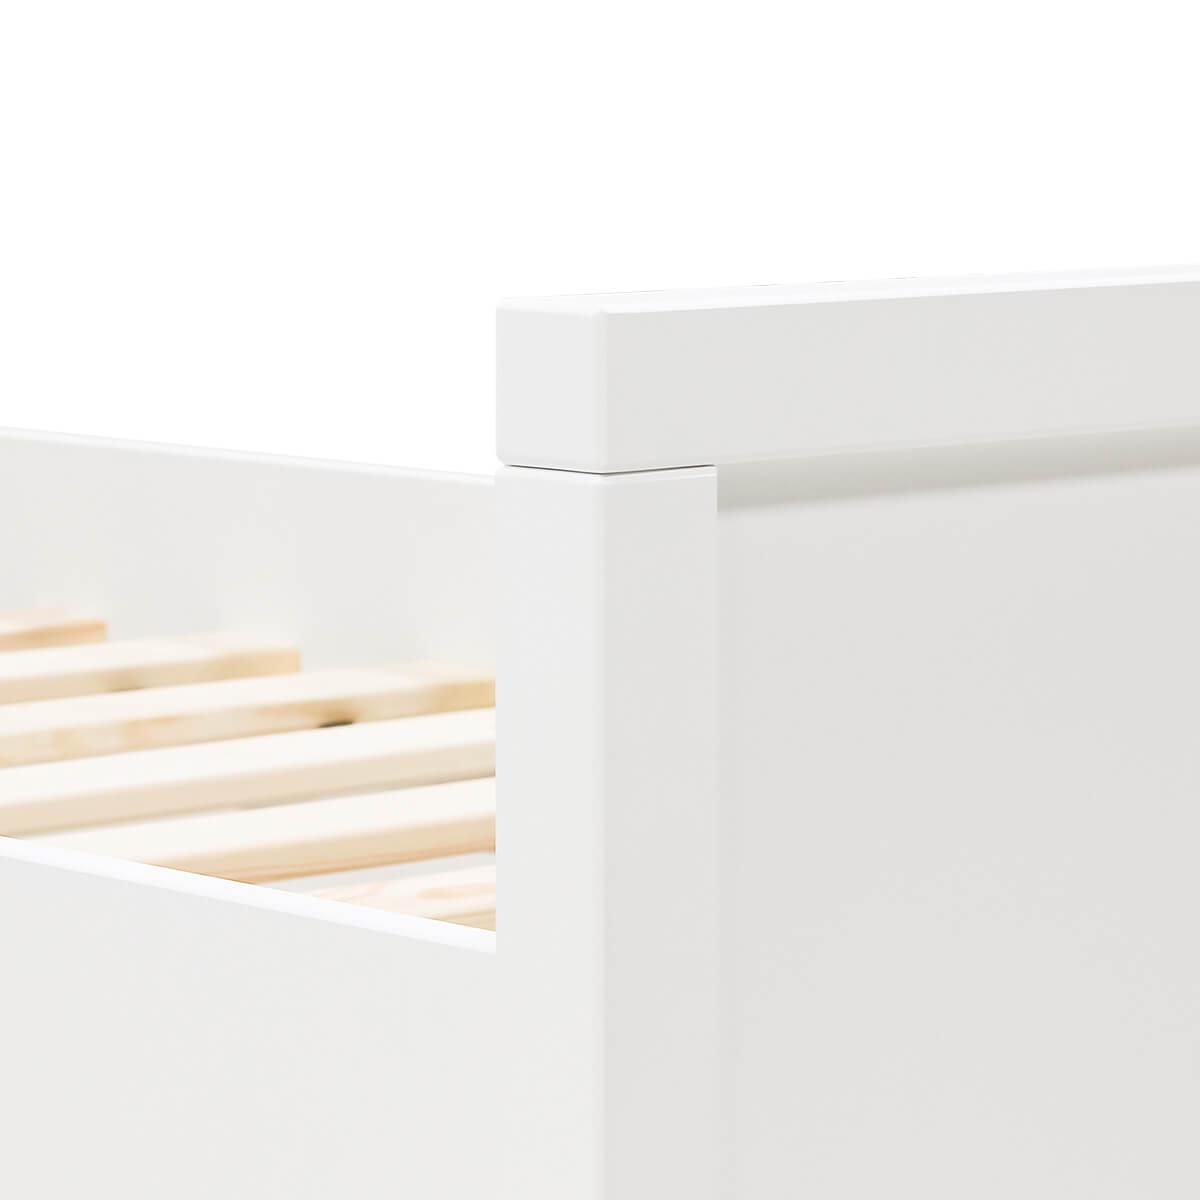 Einzelbett 90x200cm CORSICA Bopita Weiß